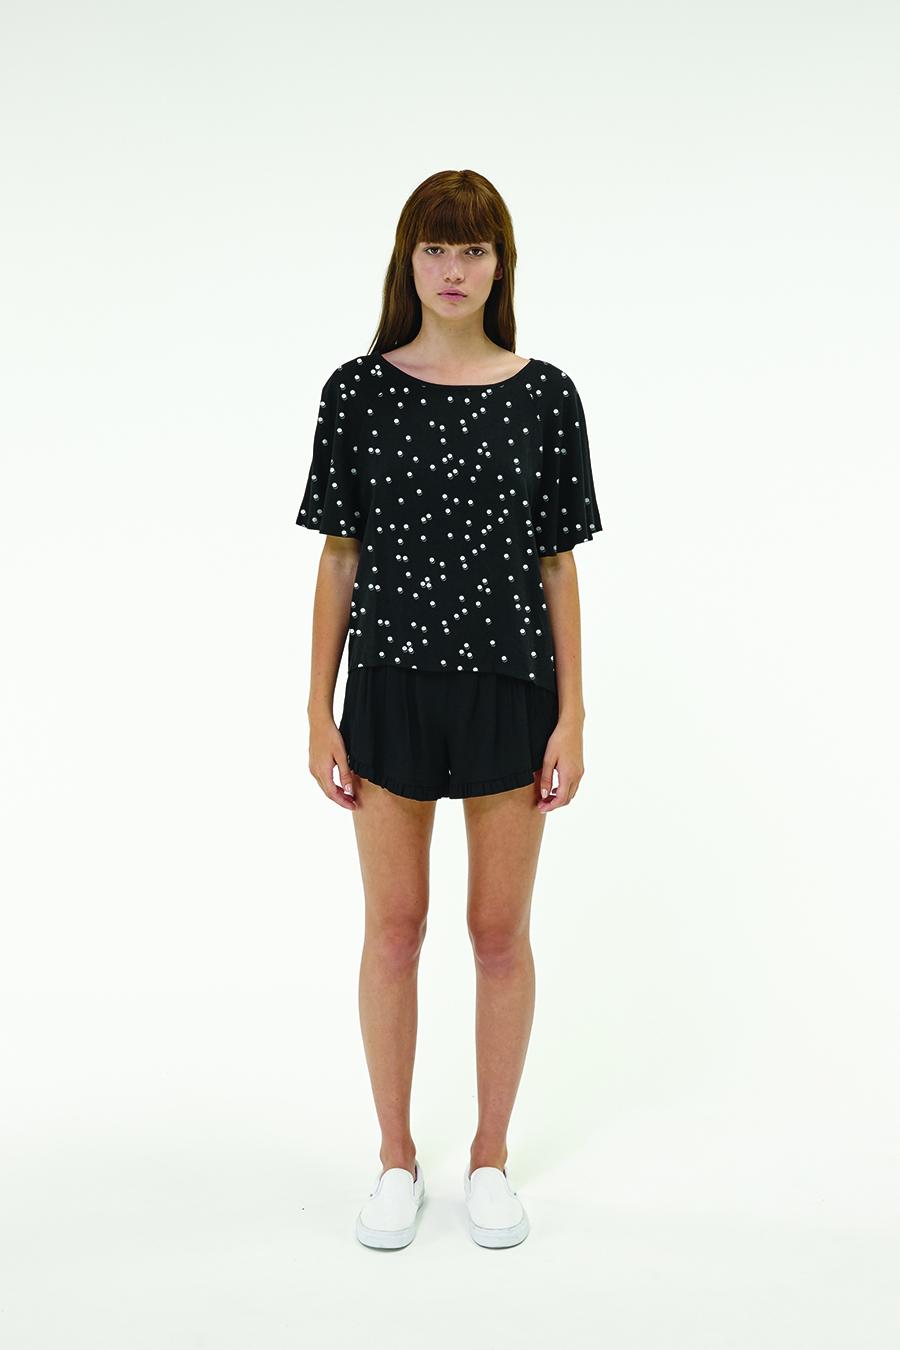 Huffer_Q3-16_W-Rosie-Volley-Top_Black-01